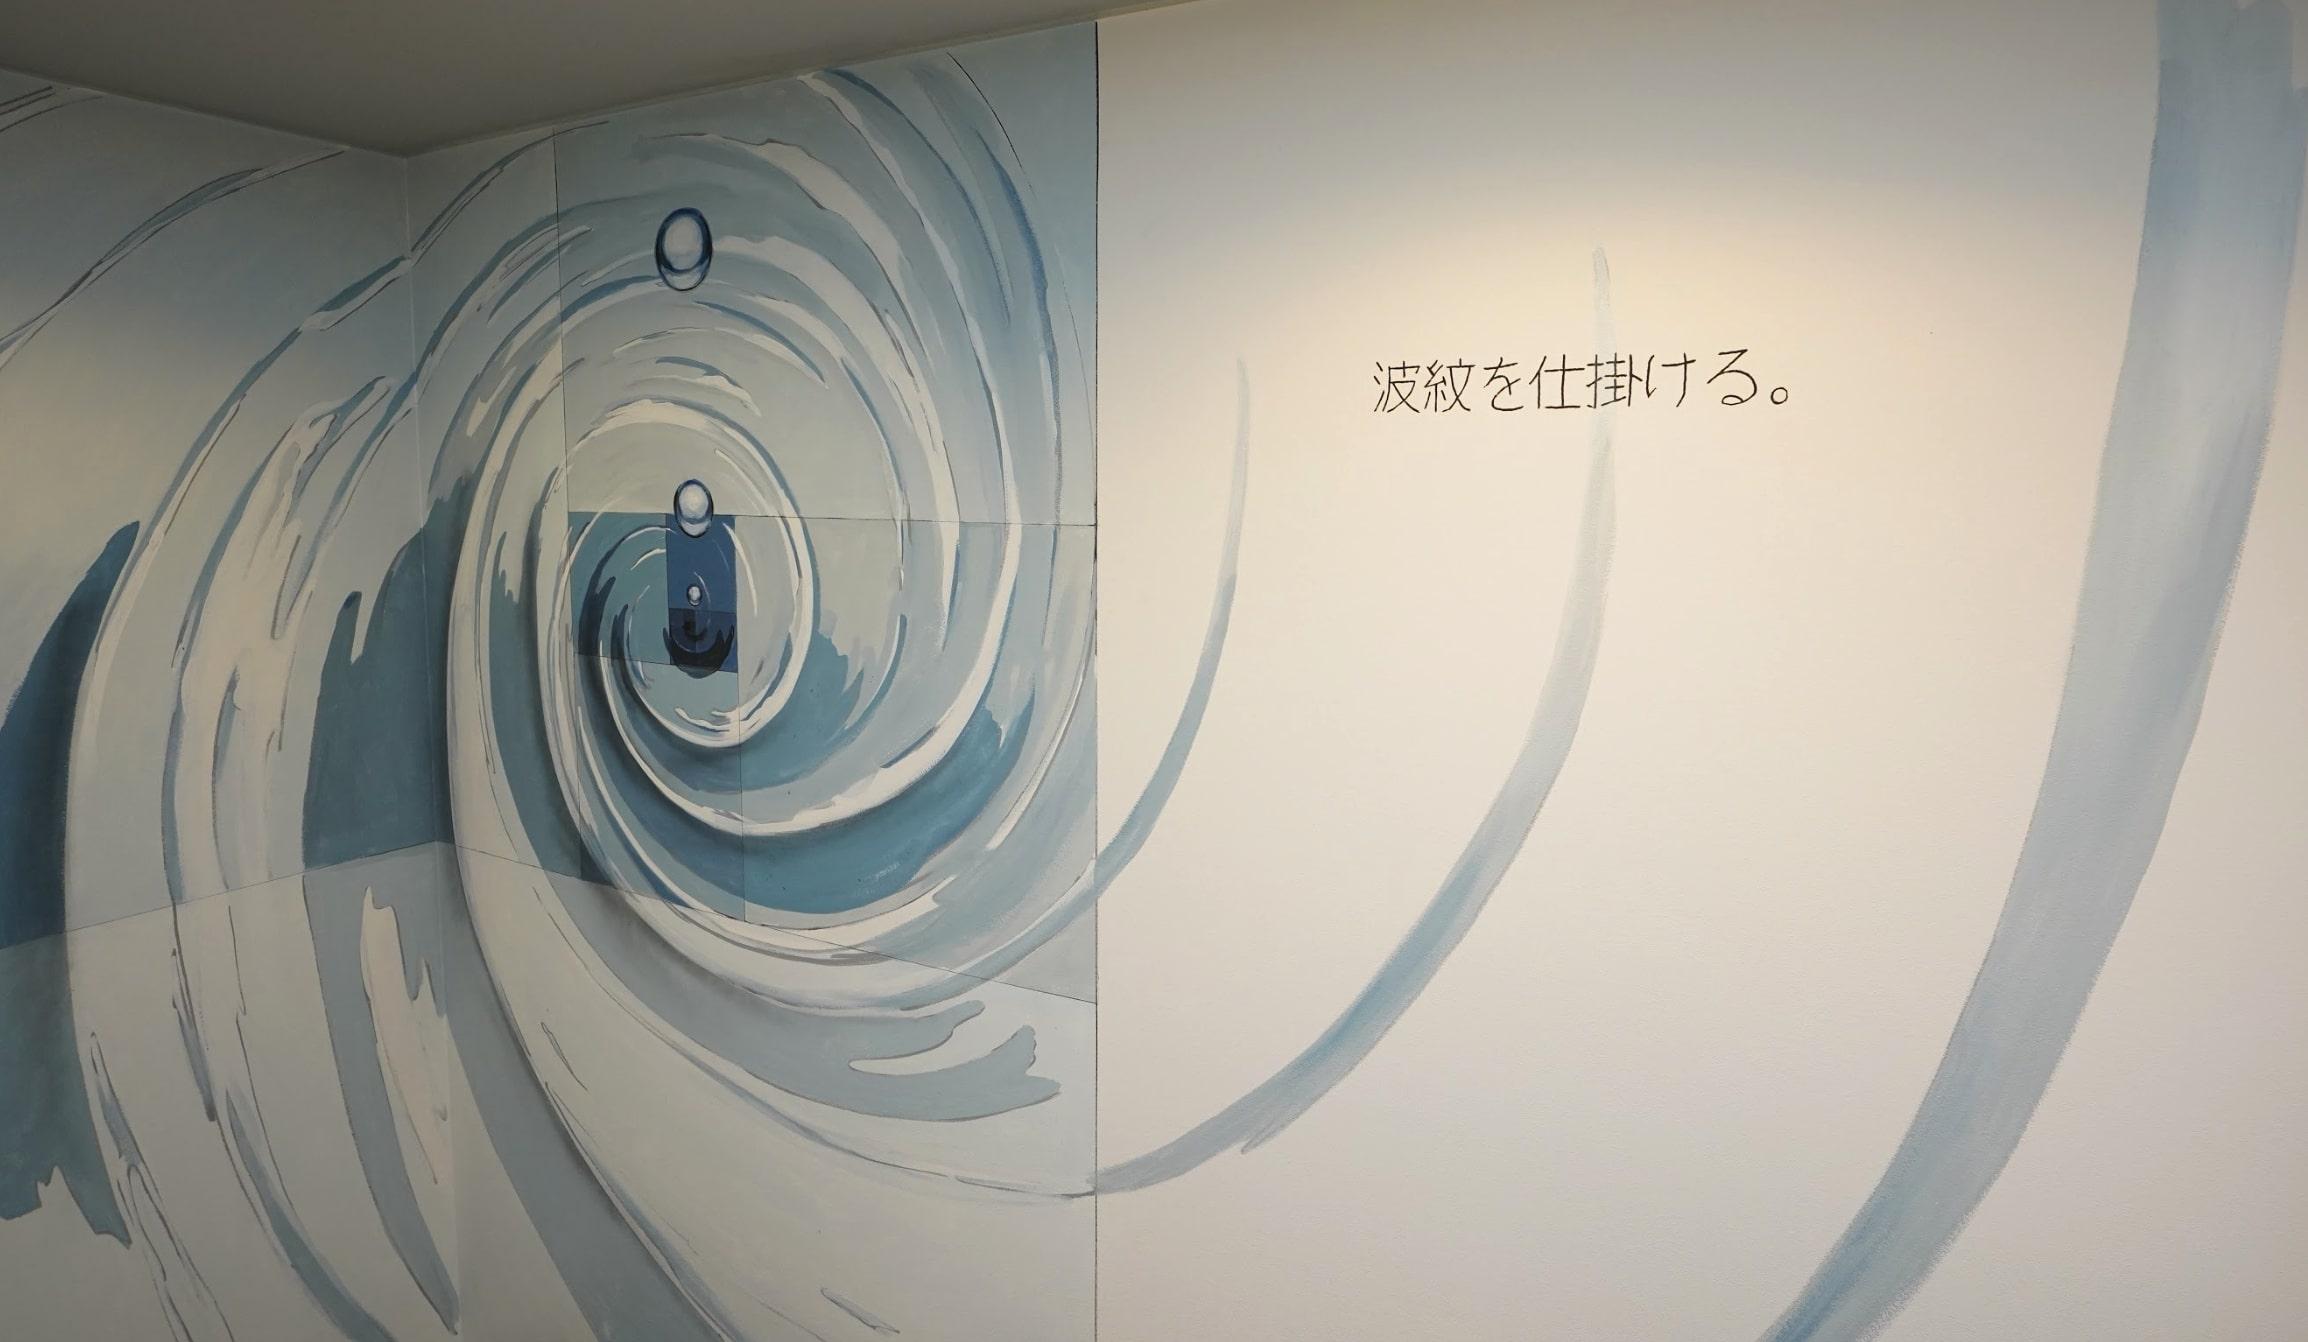 image from 第3会議室「波紋を仕掛ける。」